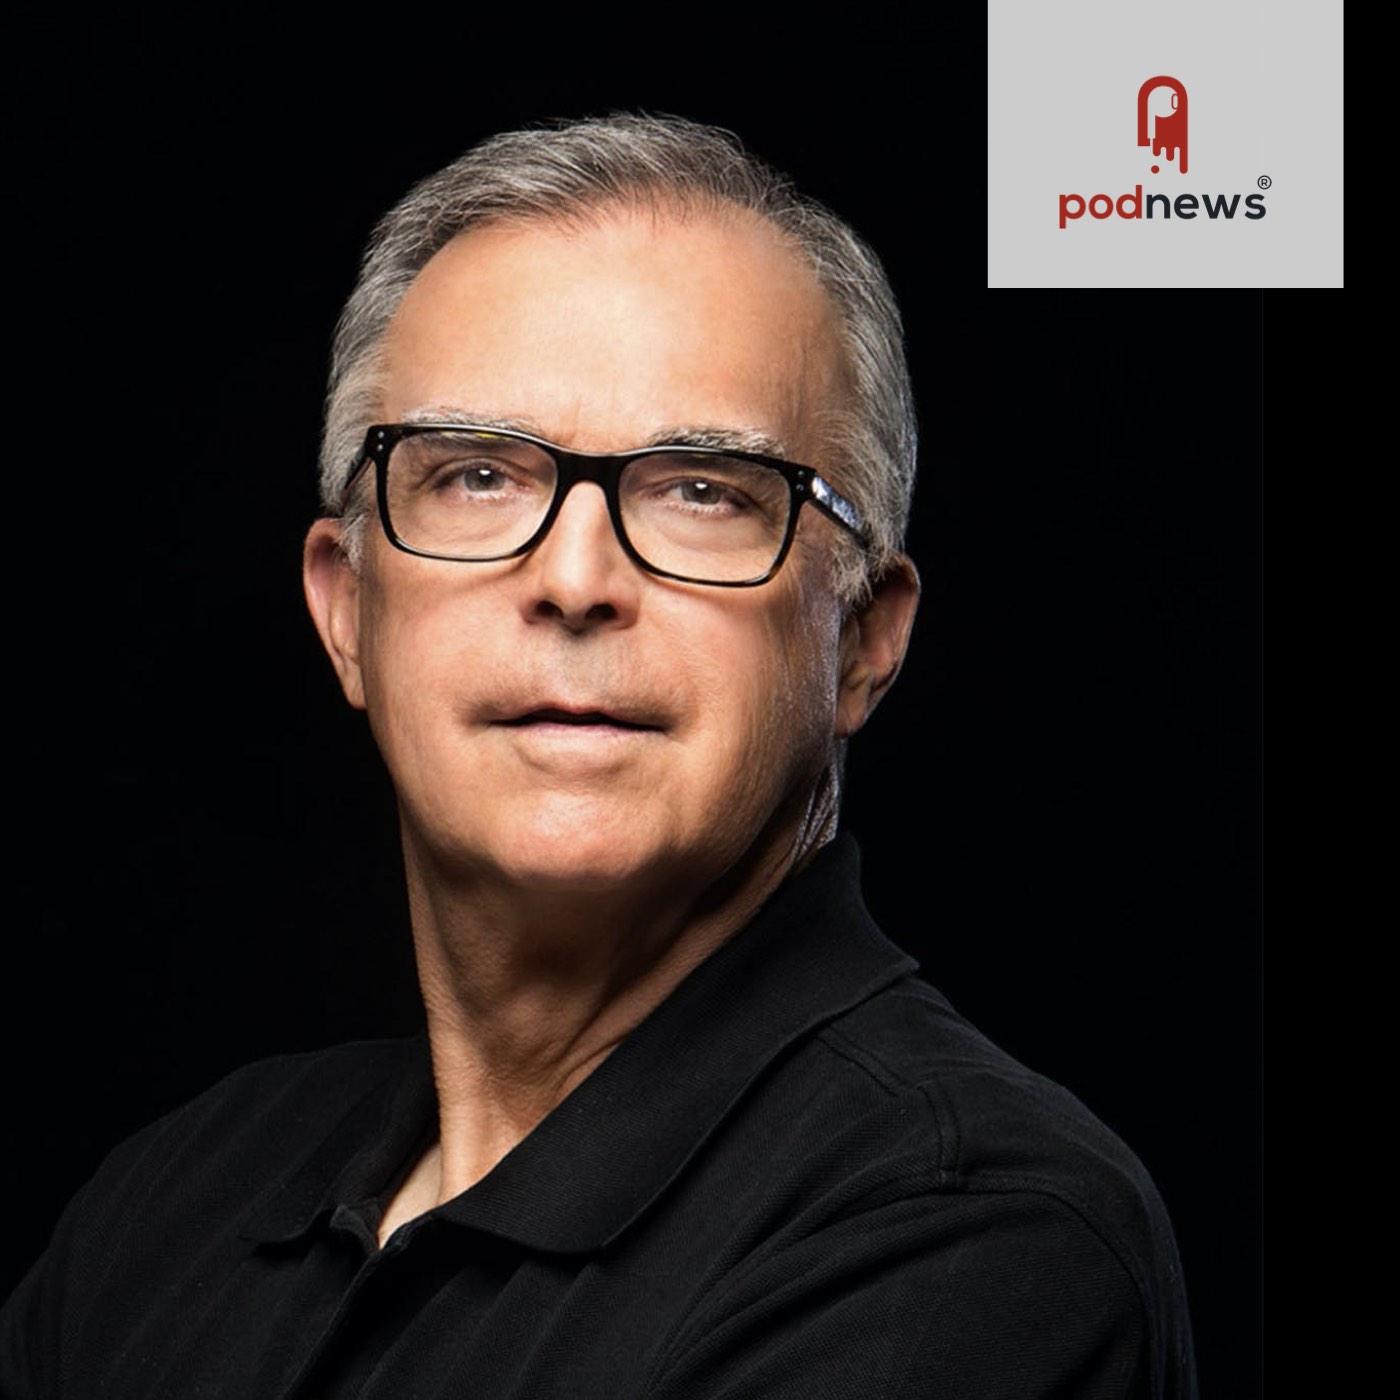 Award-winning investigative journalist Robert Riggs talks to Podnews